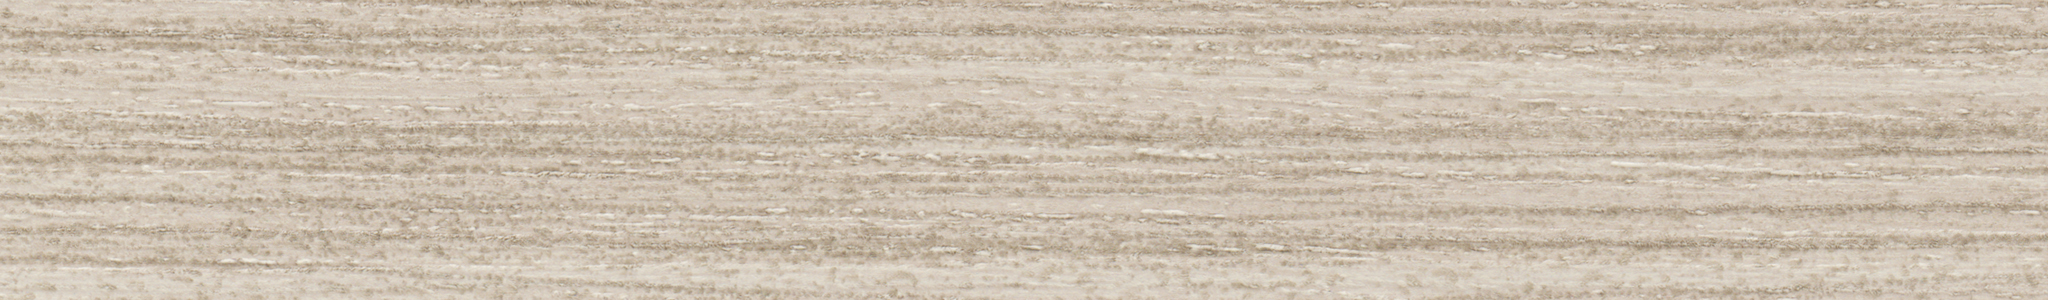 HD 293091 кромка ABS driftwood гравировка